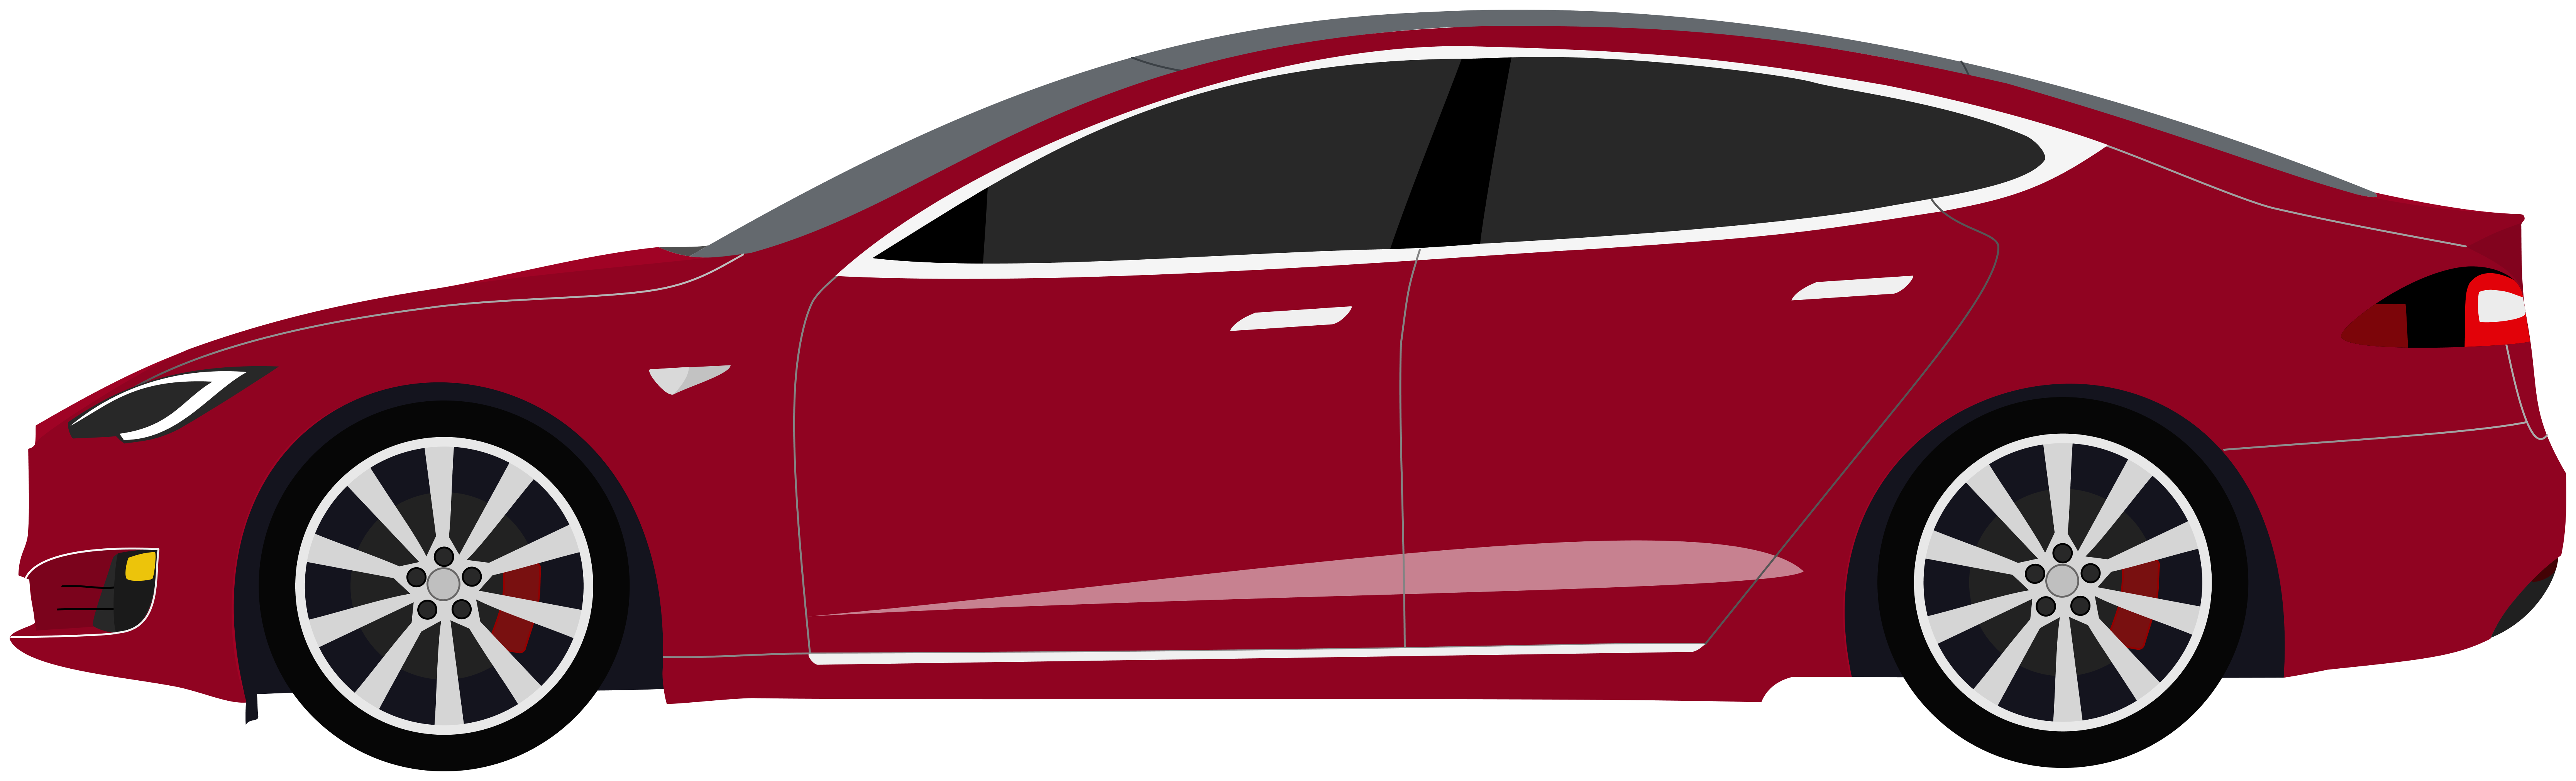 Black Tesla Model S Clipart. Signature Red Model S